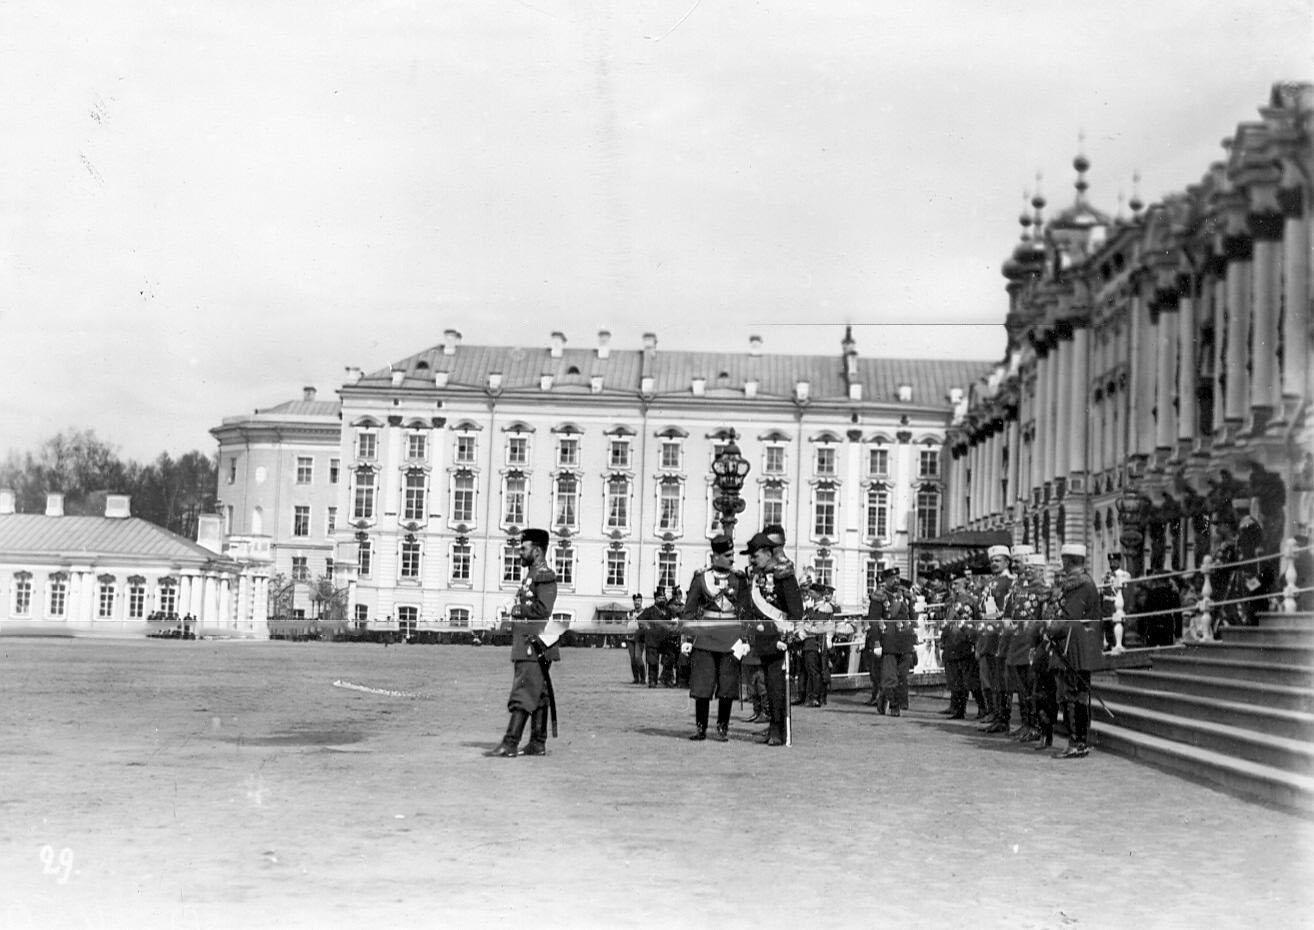 Вид части площади и Екатерининского дворца